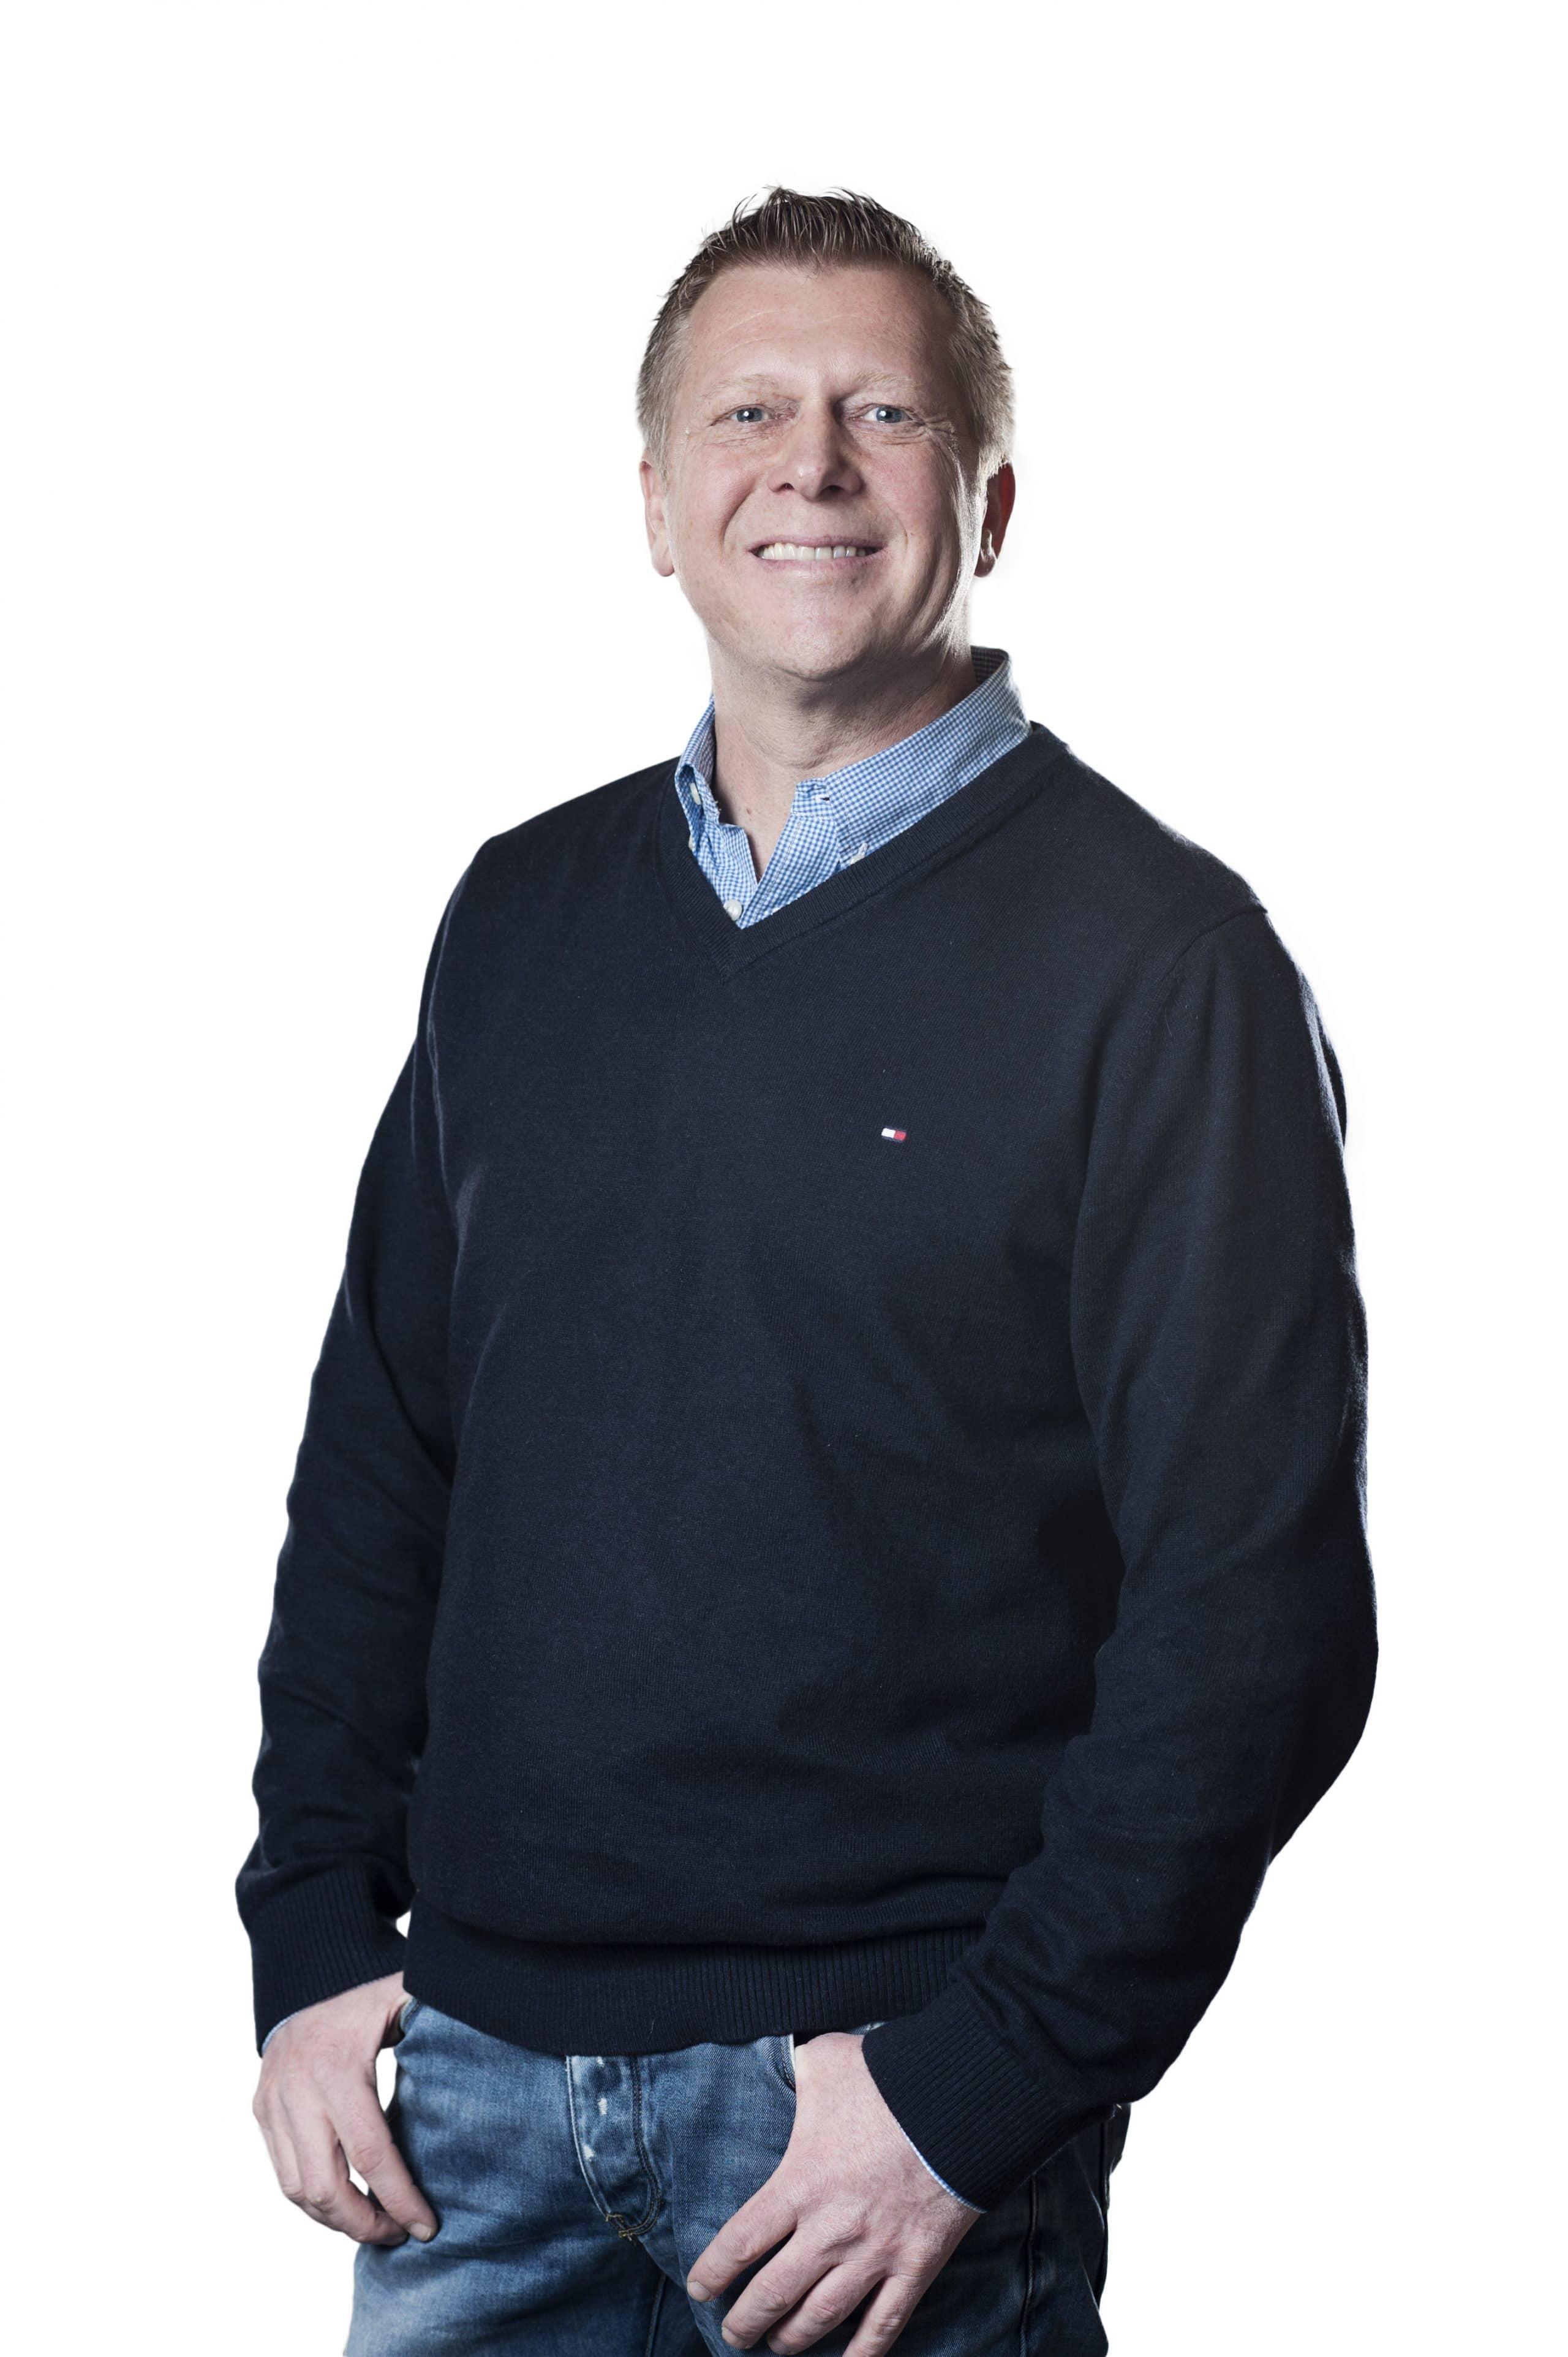 Olle Edvinsson